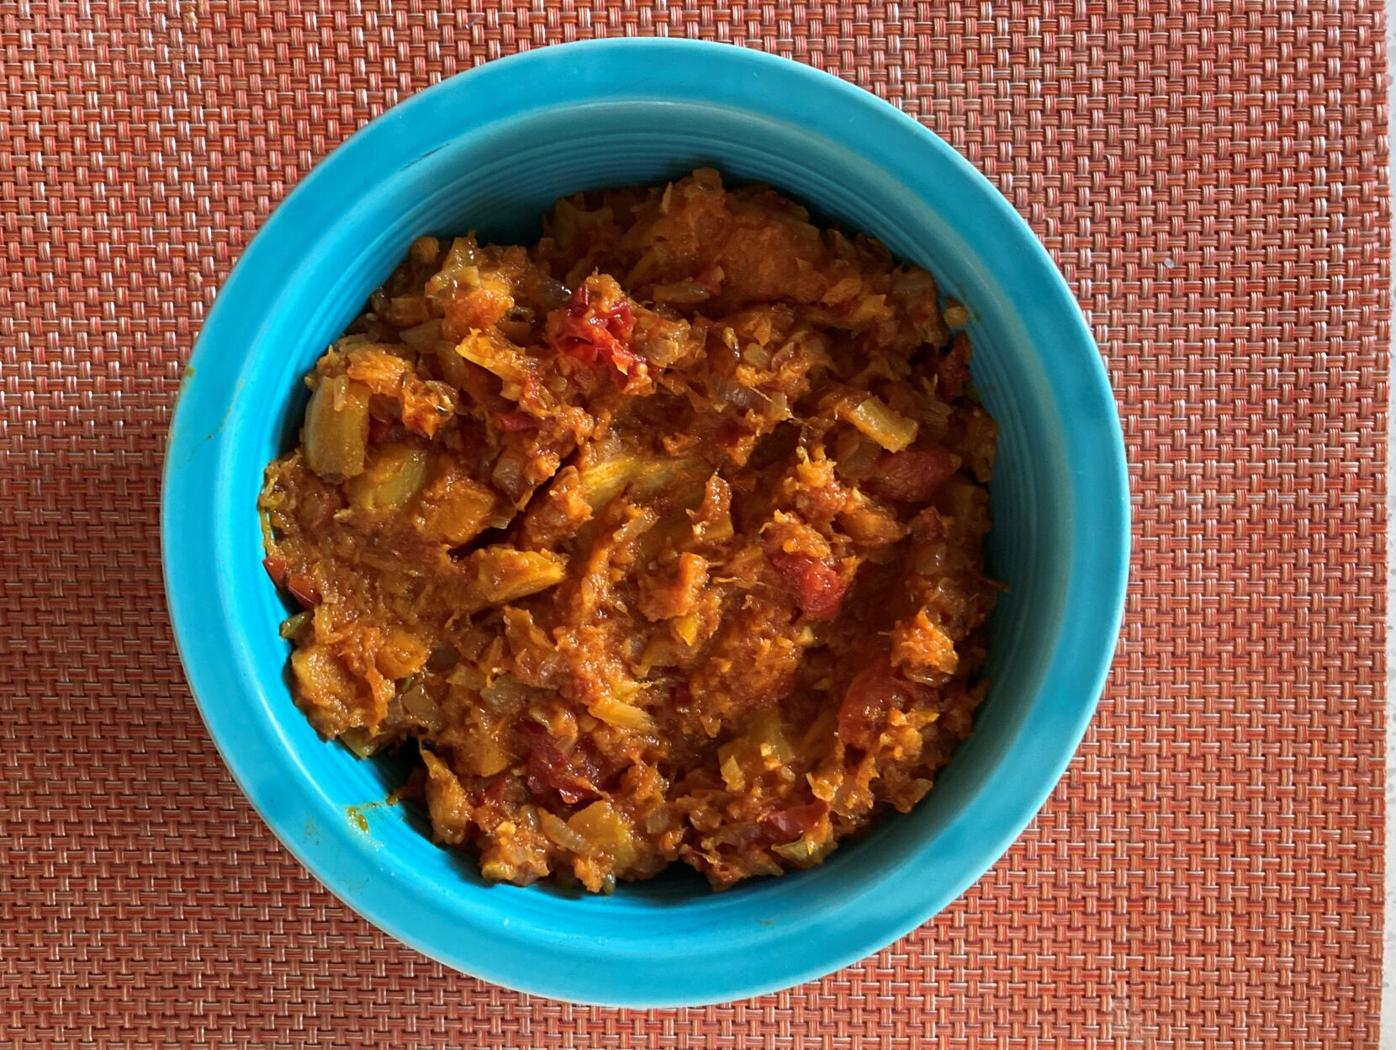 Winter squash bharta